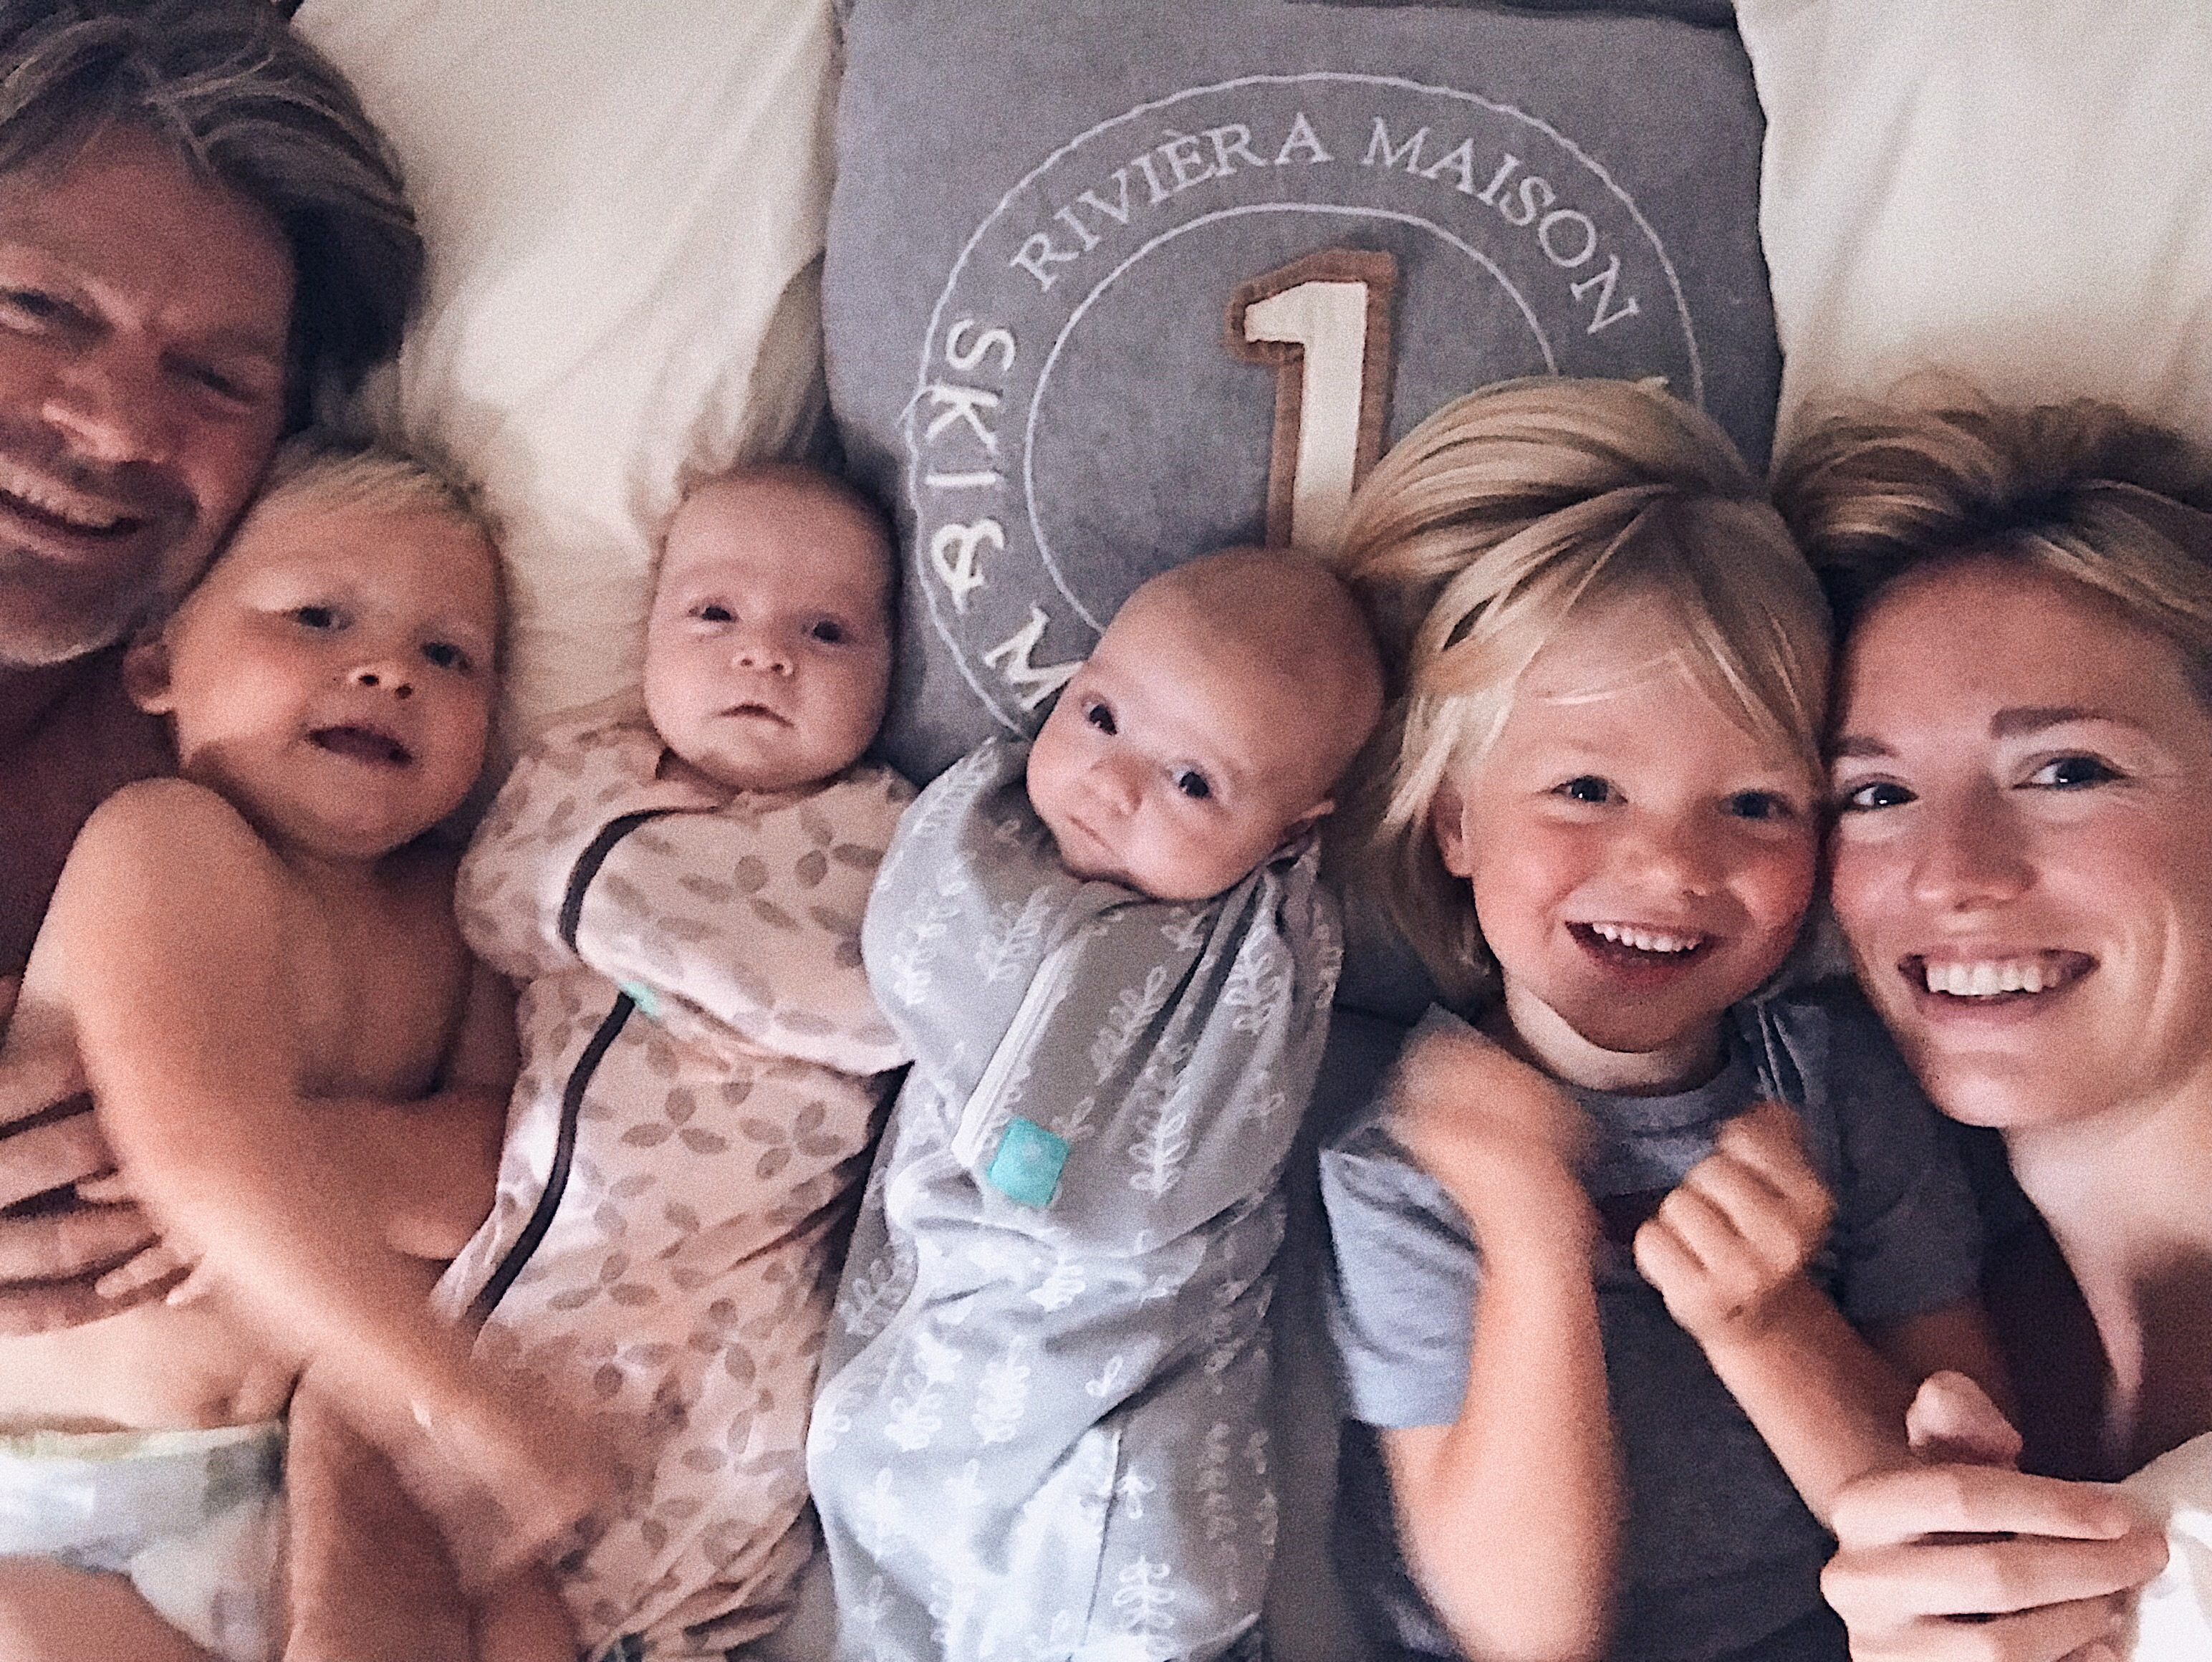 Jasper Magan Stella Penelope Joachim Valentin hele gezin